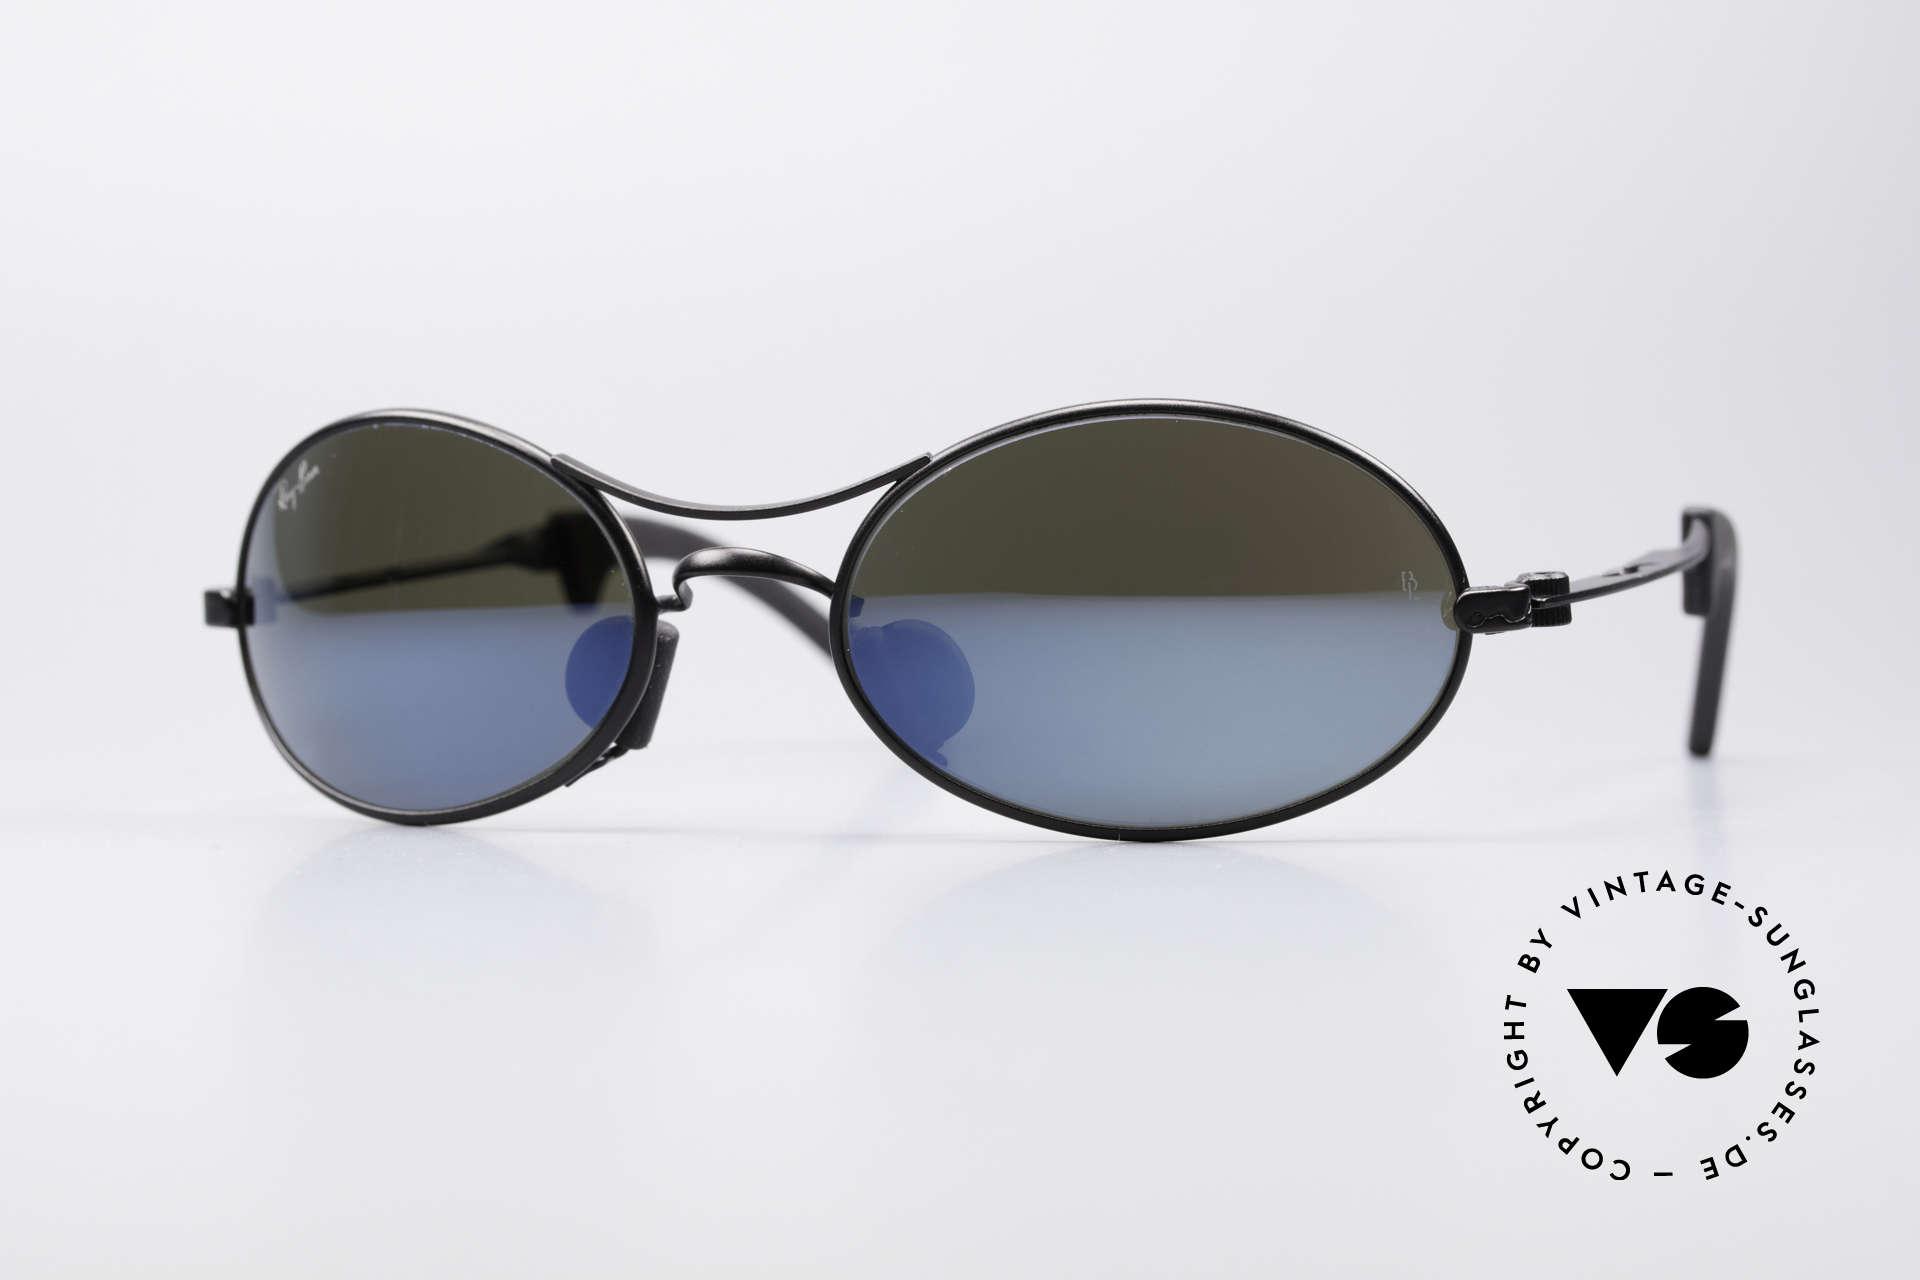 Ray Ban Orbs 9 Base Oval Blue Mirror B&L USA Shades, futuristic sports designer sunglasses by Ray Ban; B&L, Made for Men